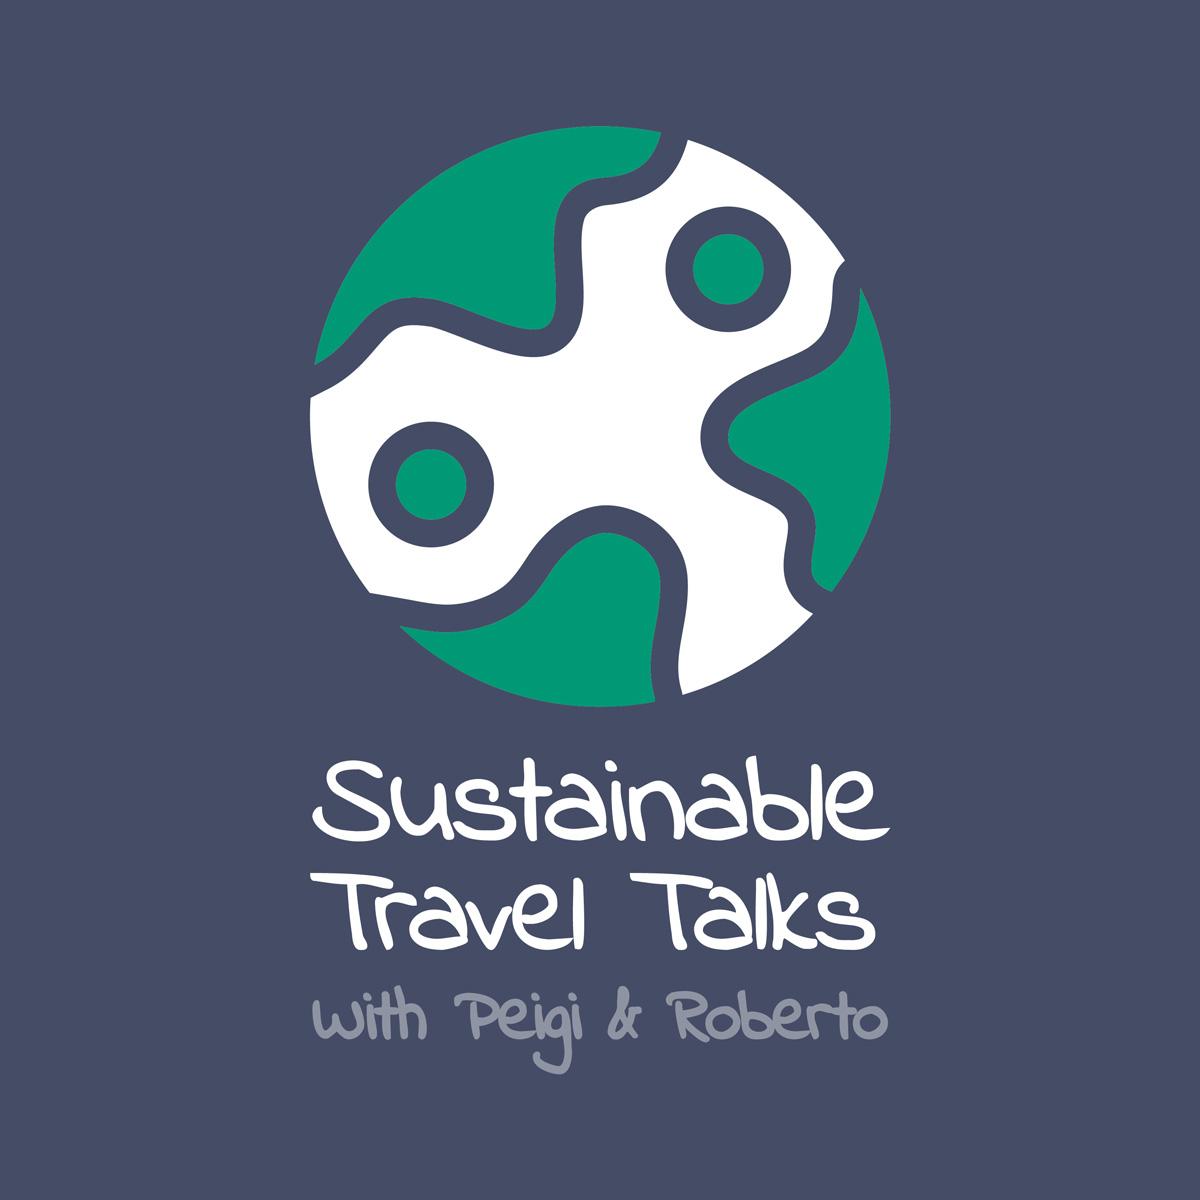 Scott Ruigrok - Freelance - Sustainable Travel Talks logo